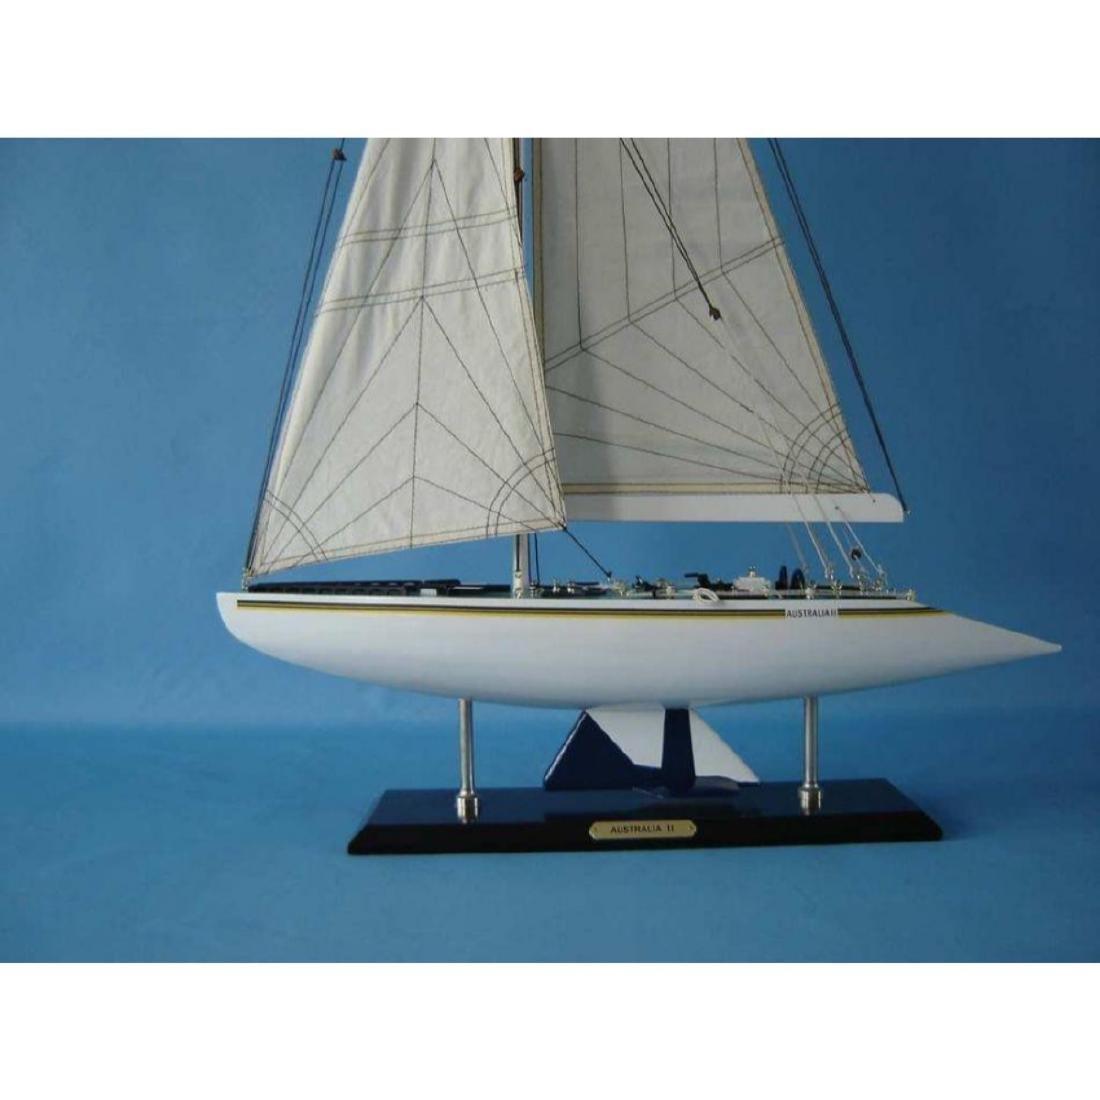 "Wooden Australia 2 Limited Model Yacht 40"" - 2"